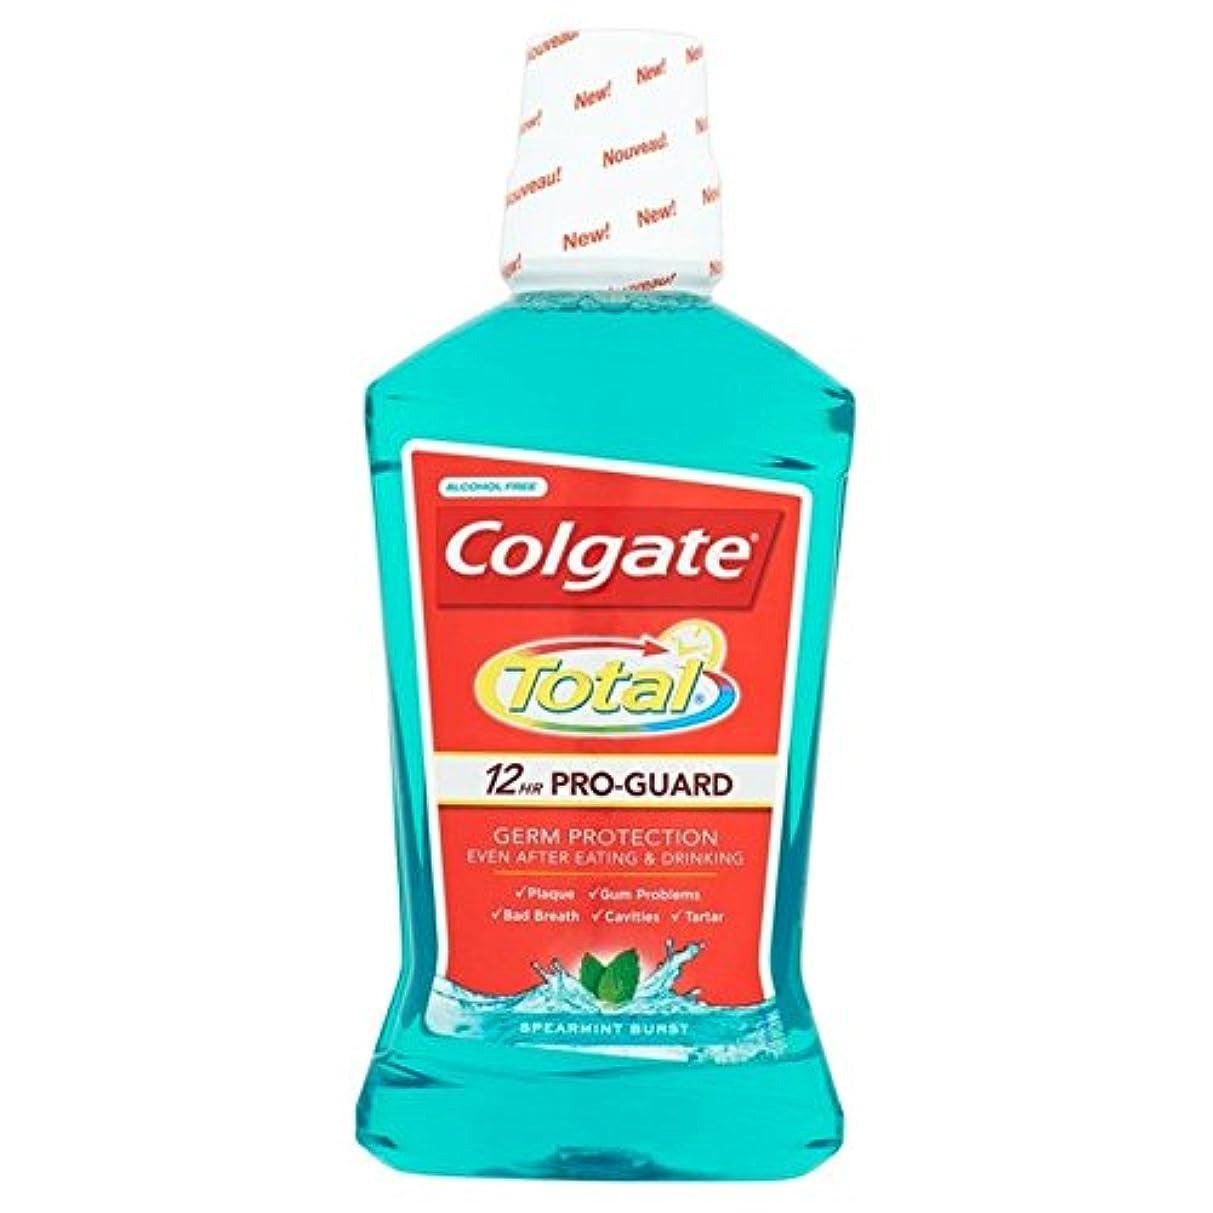 Colgate Total Advanced Green Mouthwash 500ml 500ml (Pack of 6) - コルゲートトータル先進的な緑色のマウスウォッシュ500ミリリットル500ミリリットル x6...